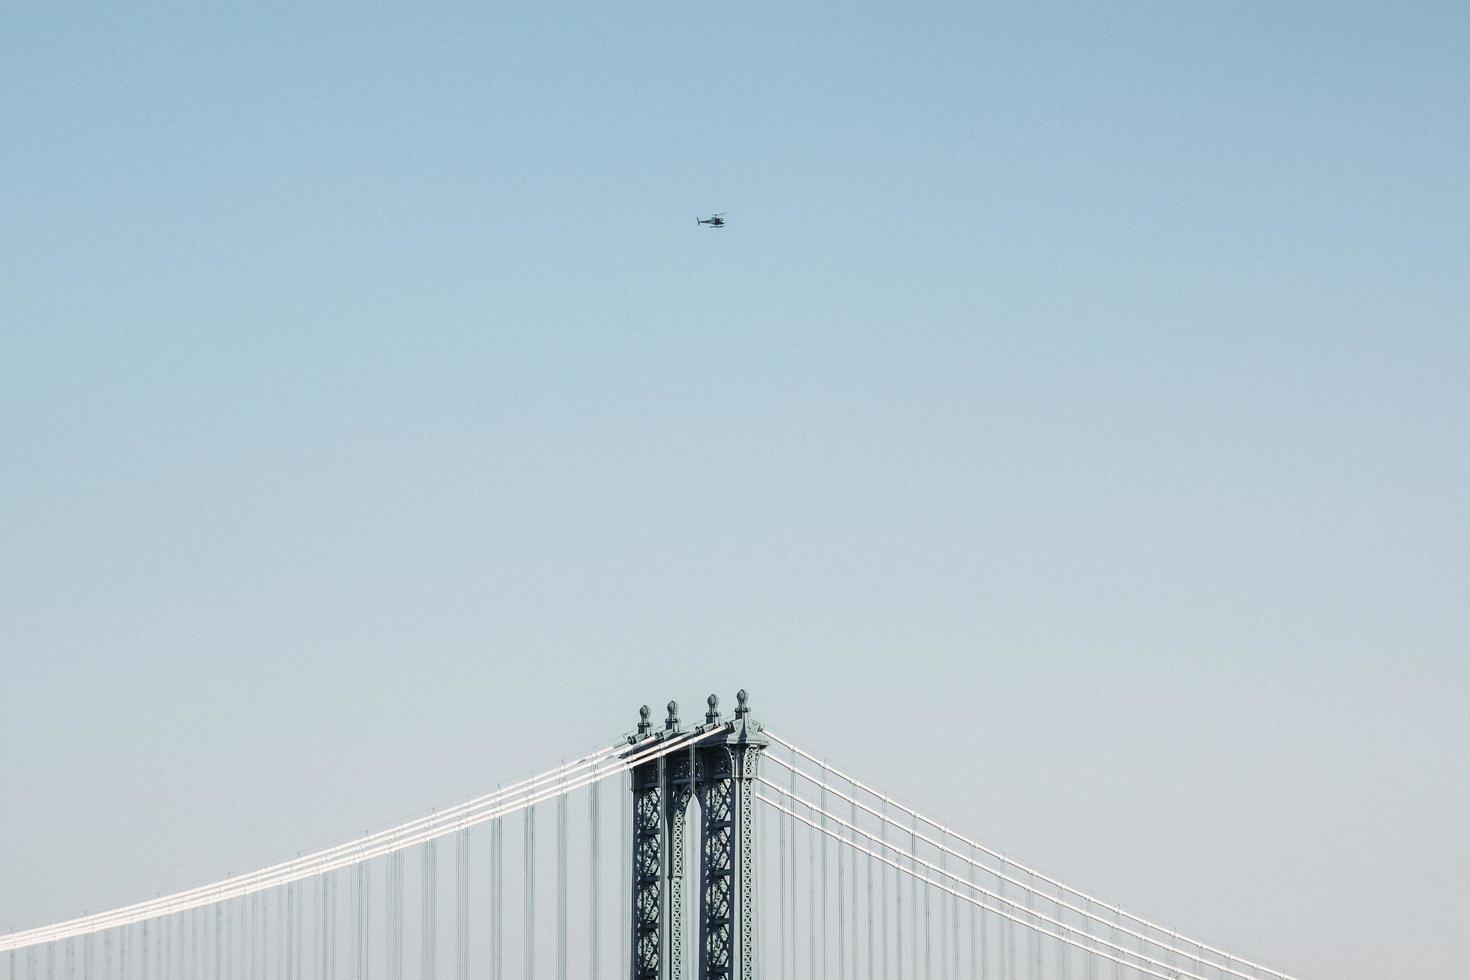 minimale Perspektive der Brücke bei Tag foto